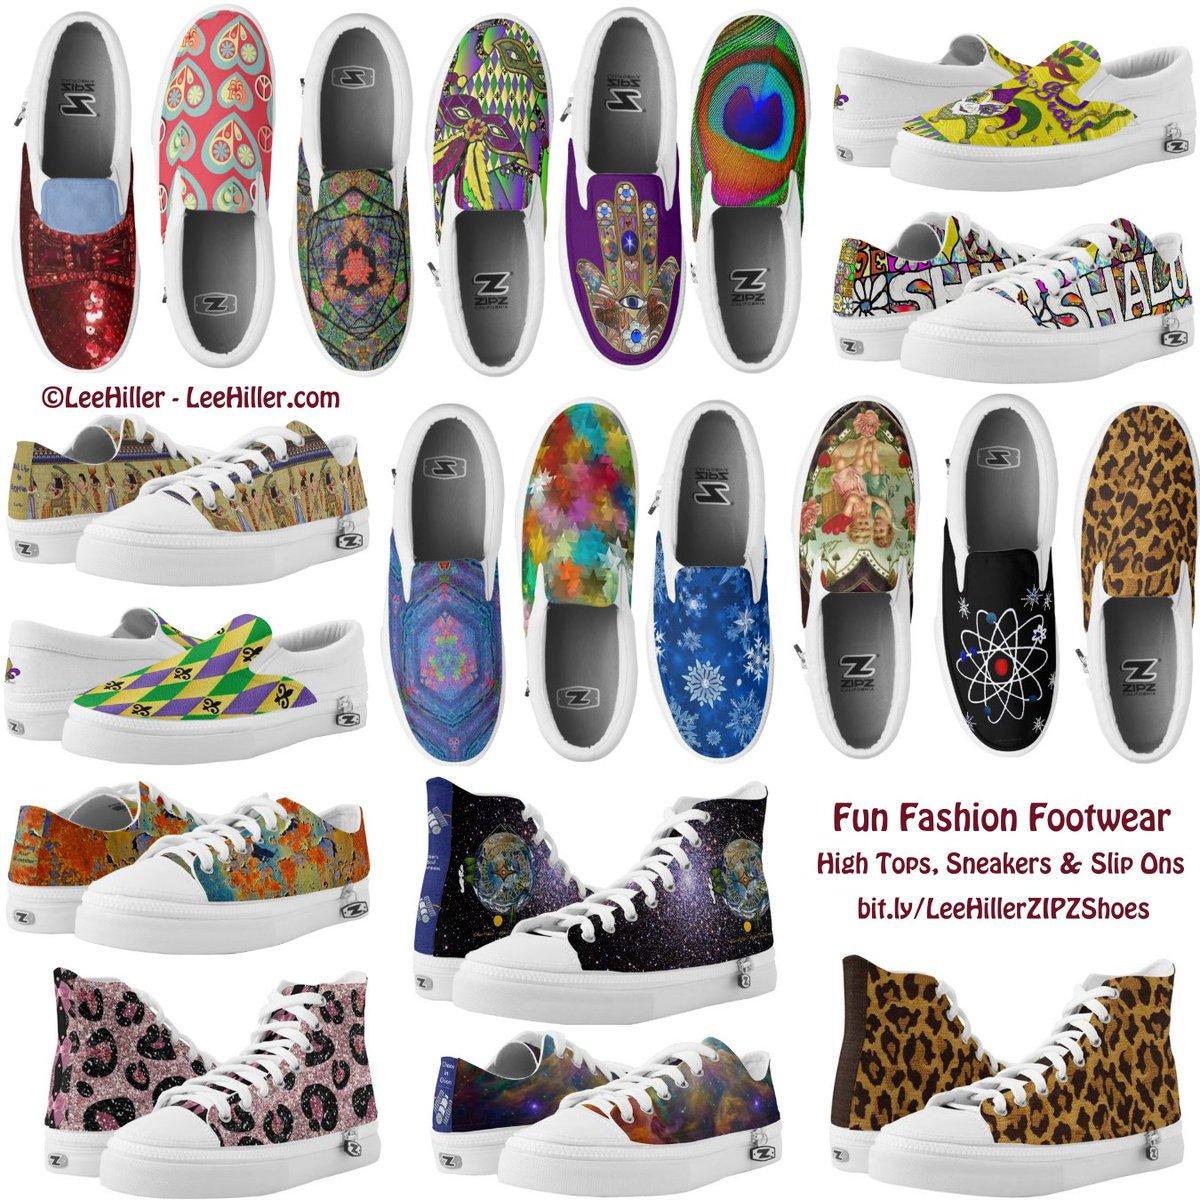 Fun Fashion #shoes #sneakers #hightops #slipons #wizardofoz #mardigras #NOLA #space #rockabilly #peacock #art #photography #design  #gifts #giftsforhim #giftsforher Men's and Women's sizes available #WorldWide #shipping http://bit.ly/LeeHillerZIPZShoes…pic.twitter.com/WzkENtKPwi